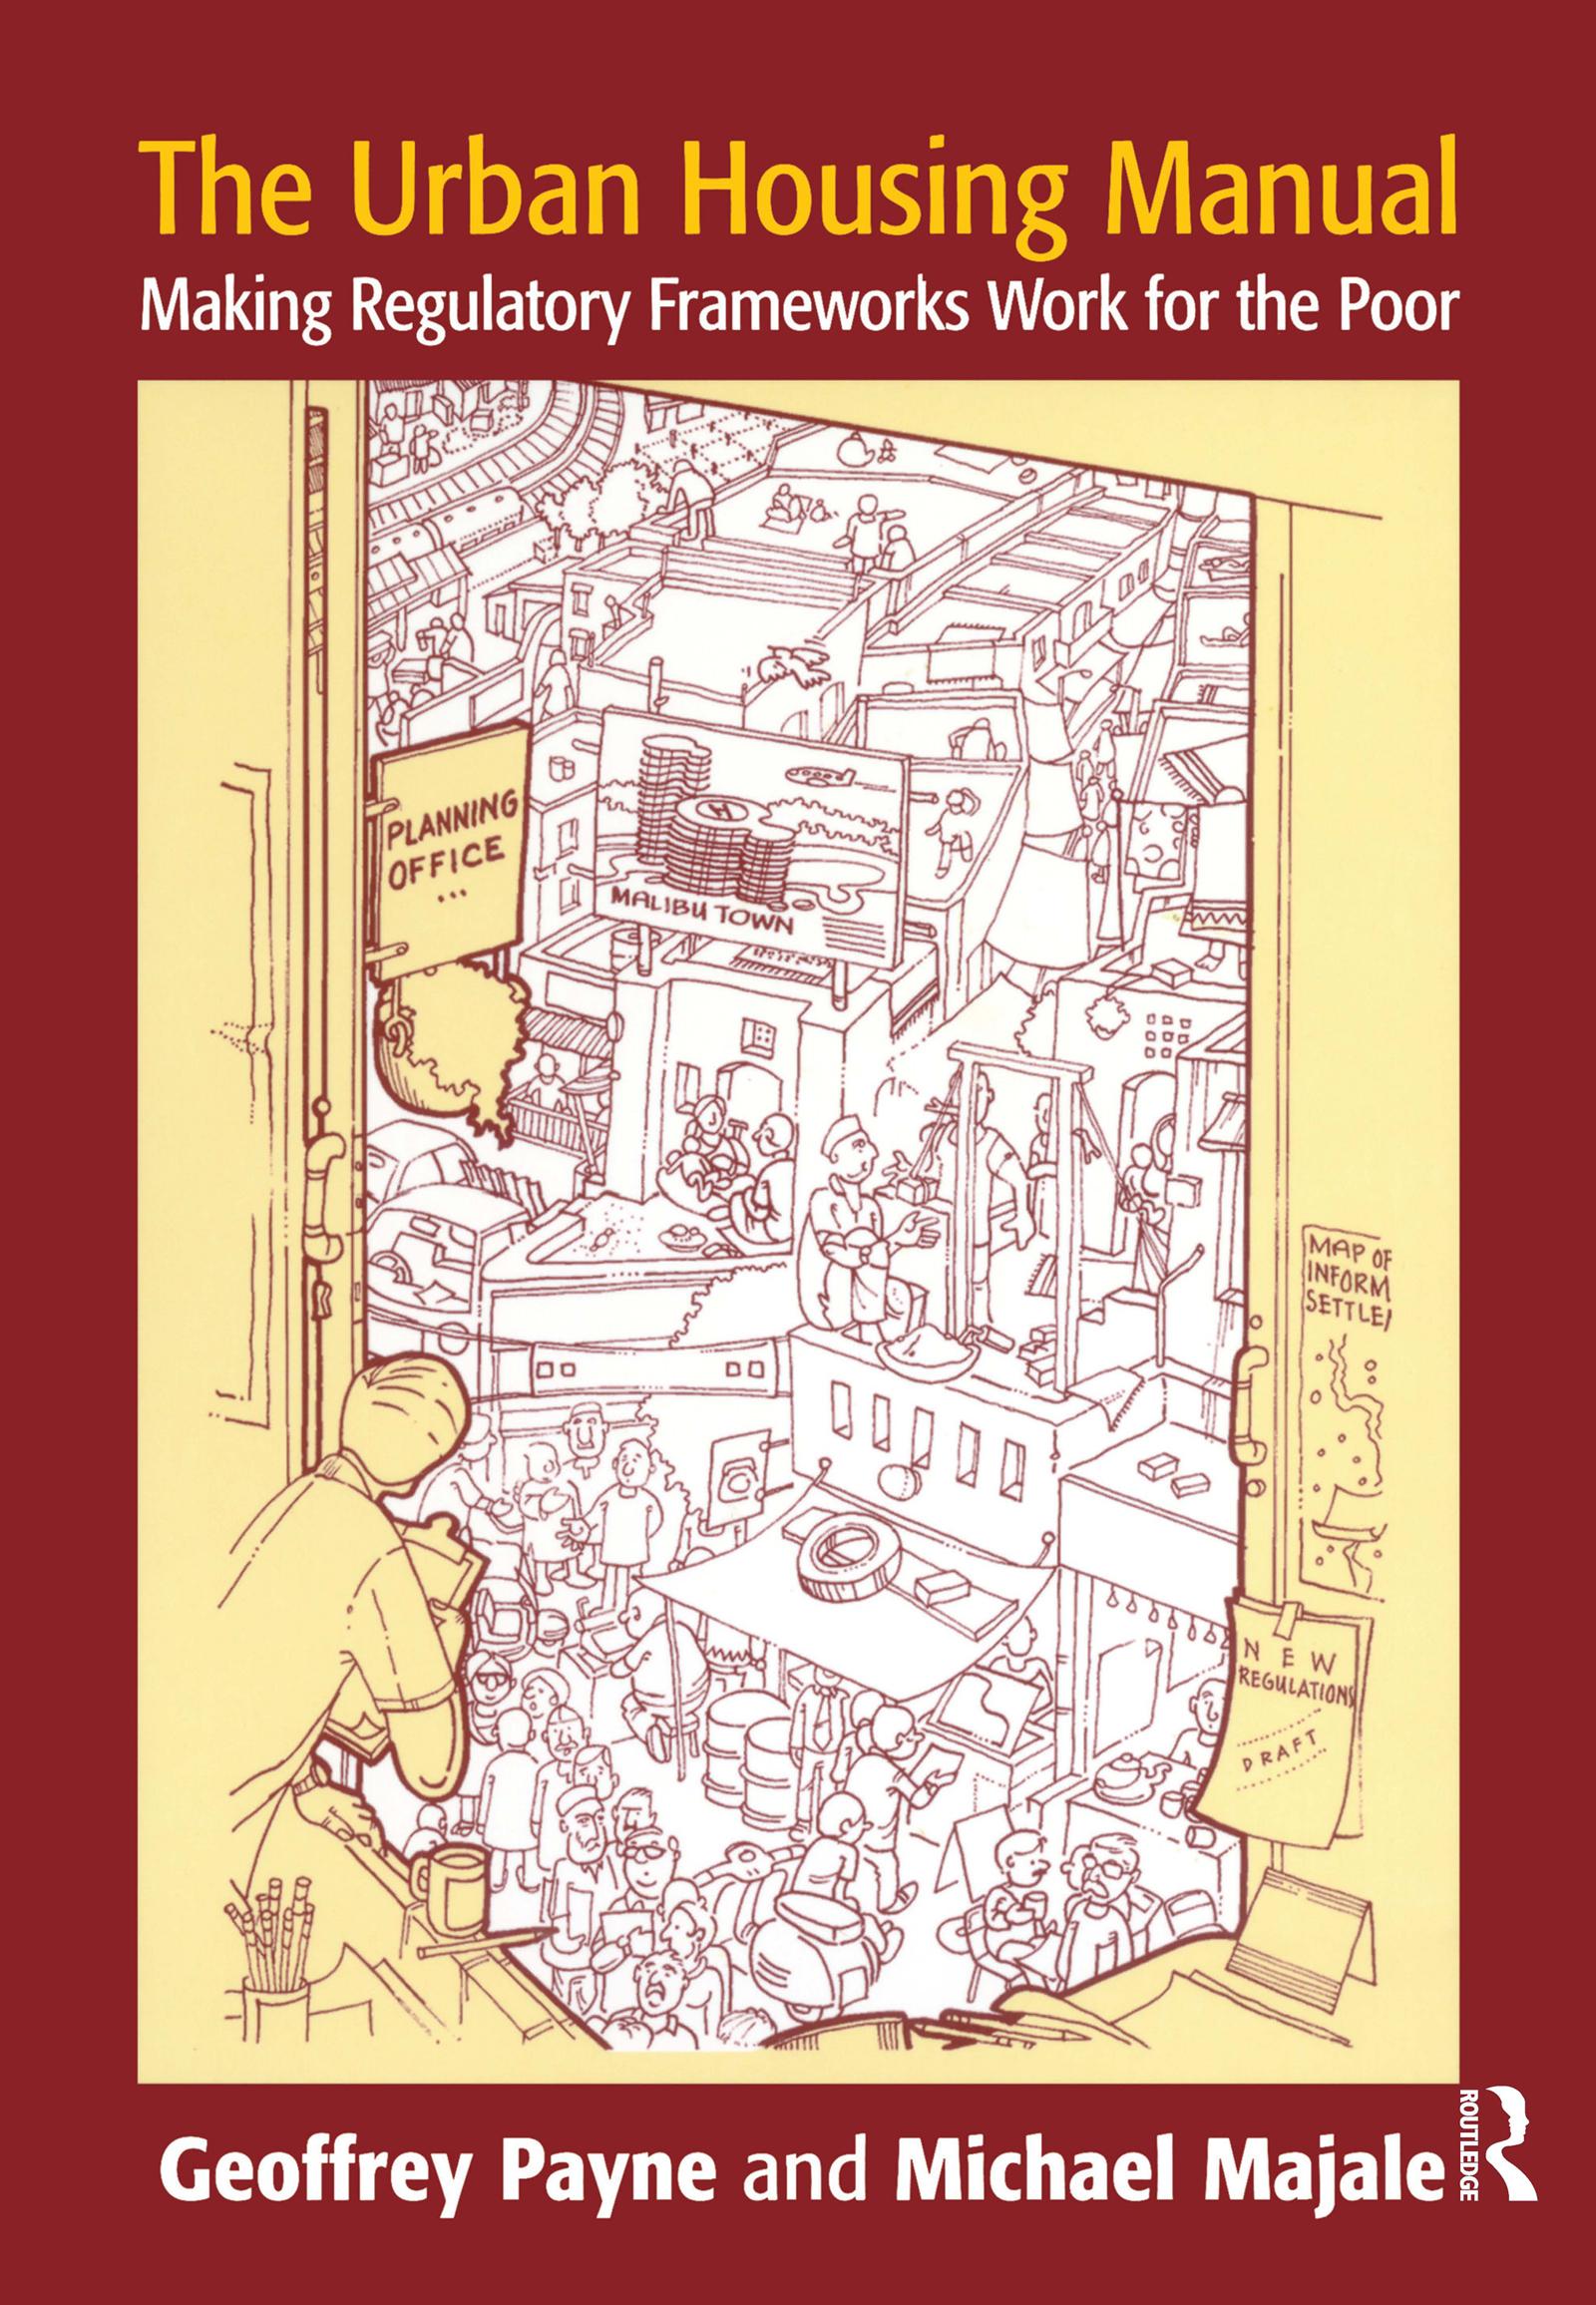 The Urban Housing Manual